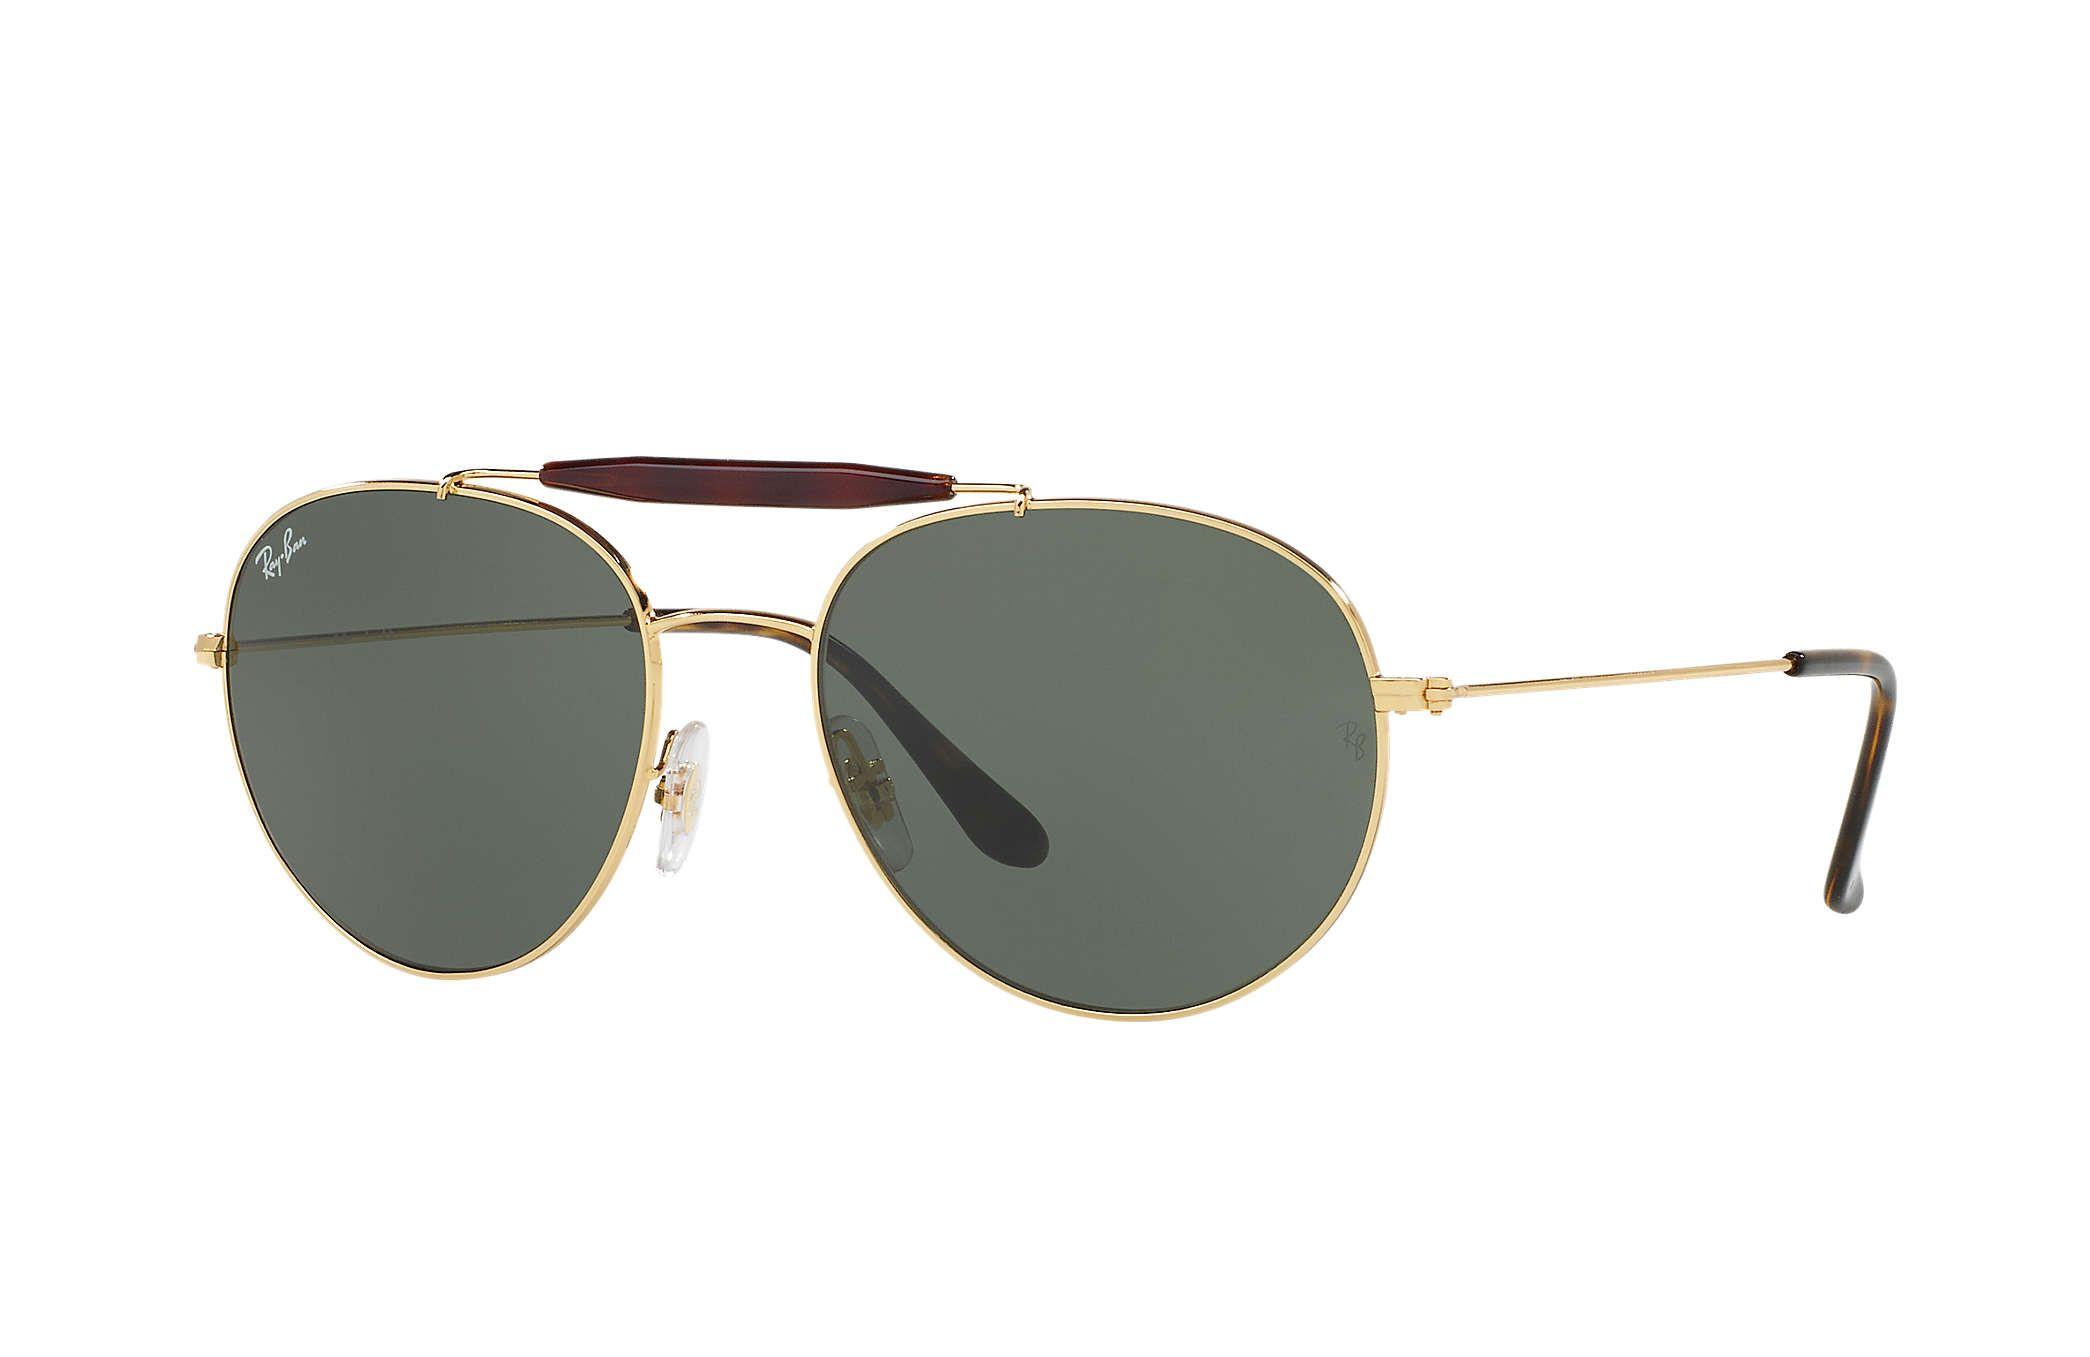 773d74718f Ray-Ban แว่นตา รุ่น RB3540